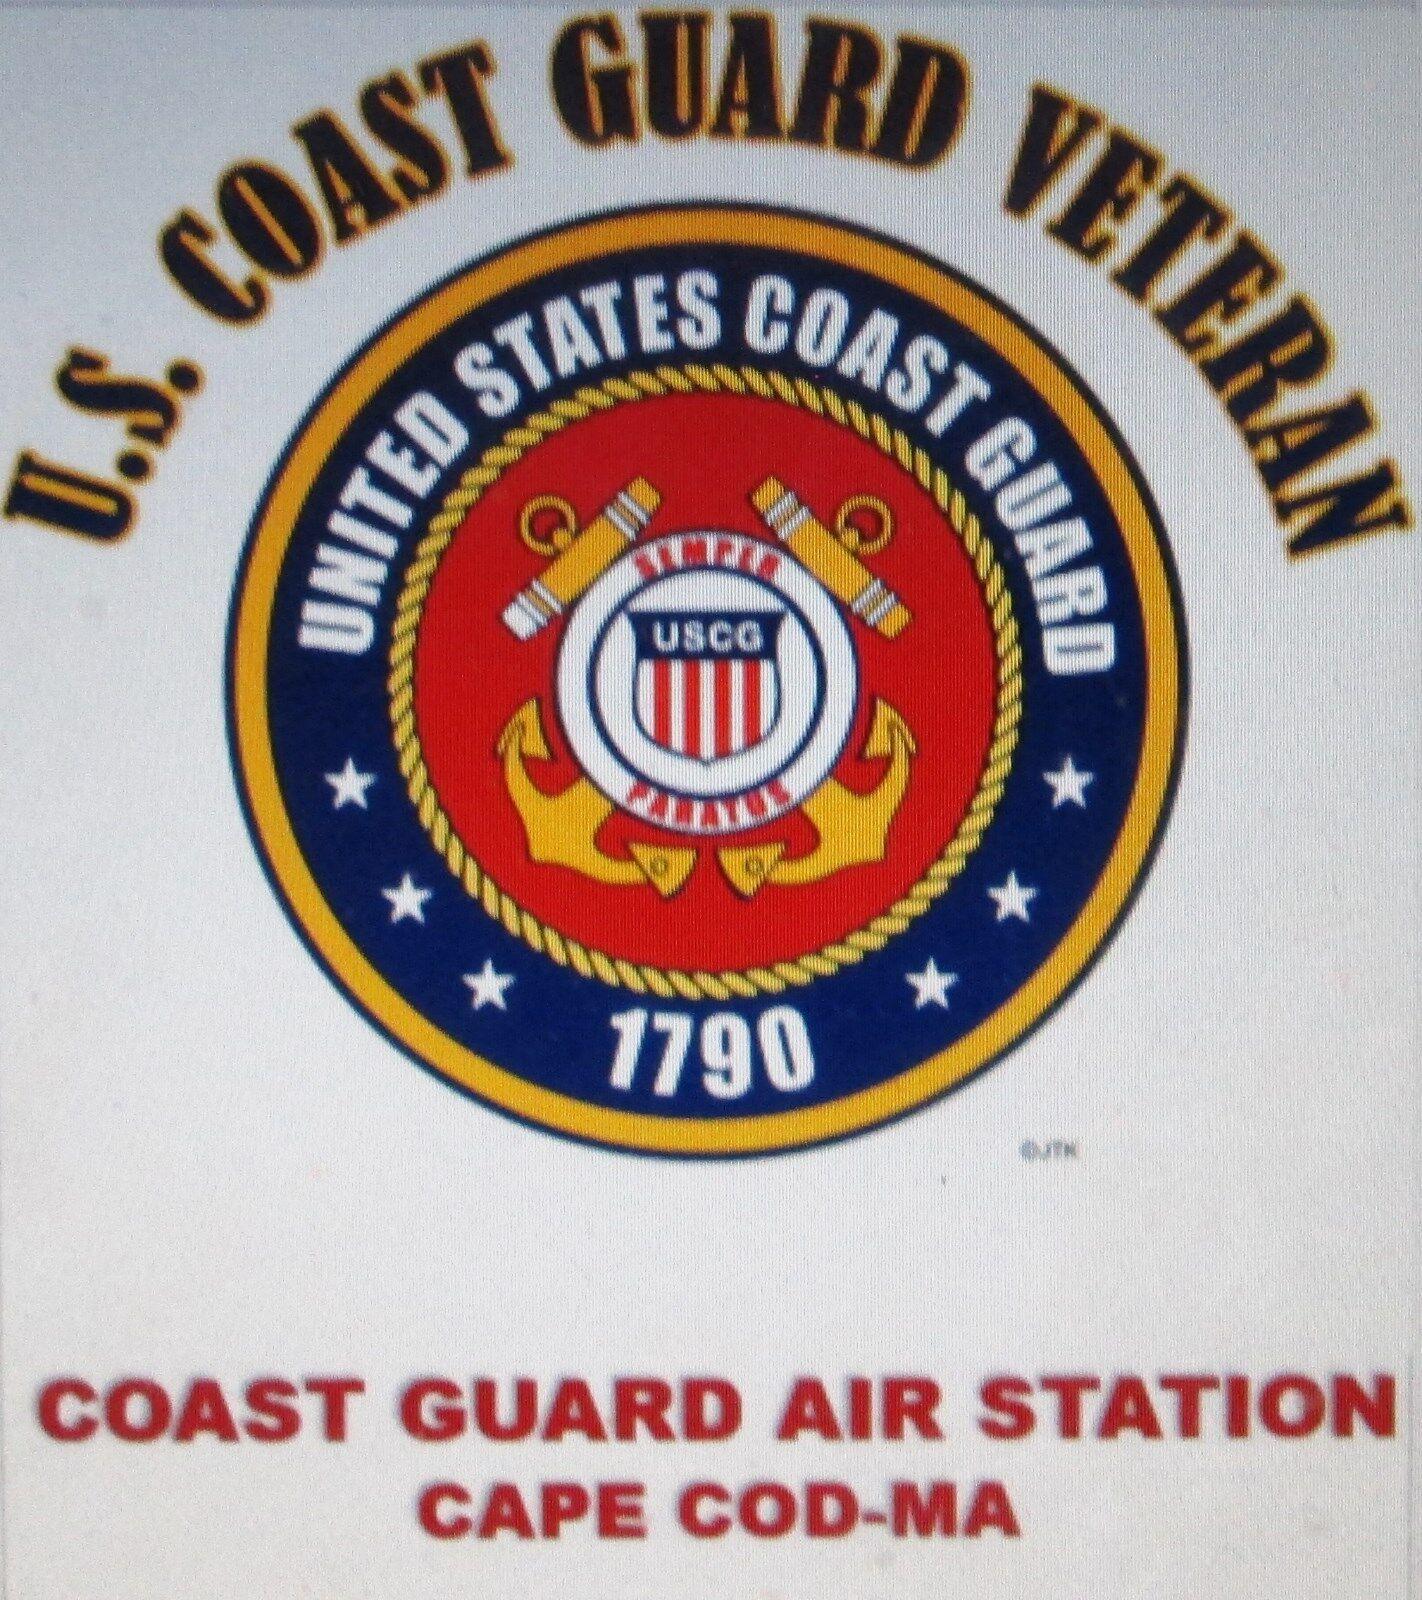 US COAST GUARD AIR STATION CAPE COD-MA*COAST GUARD VETERAN EMBLEM*SHIRT